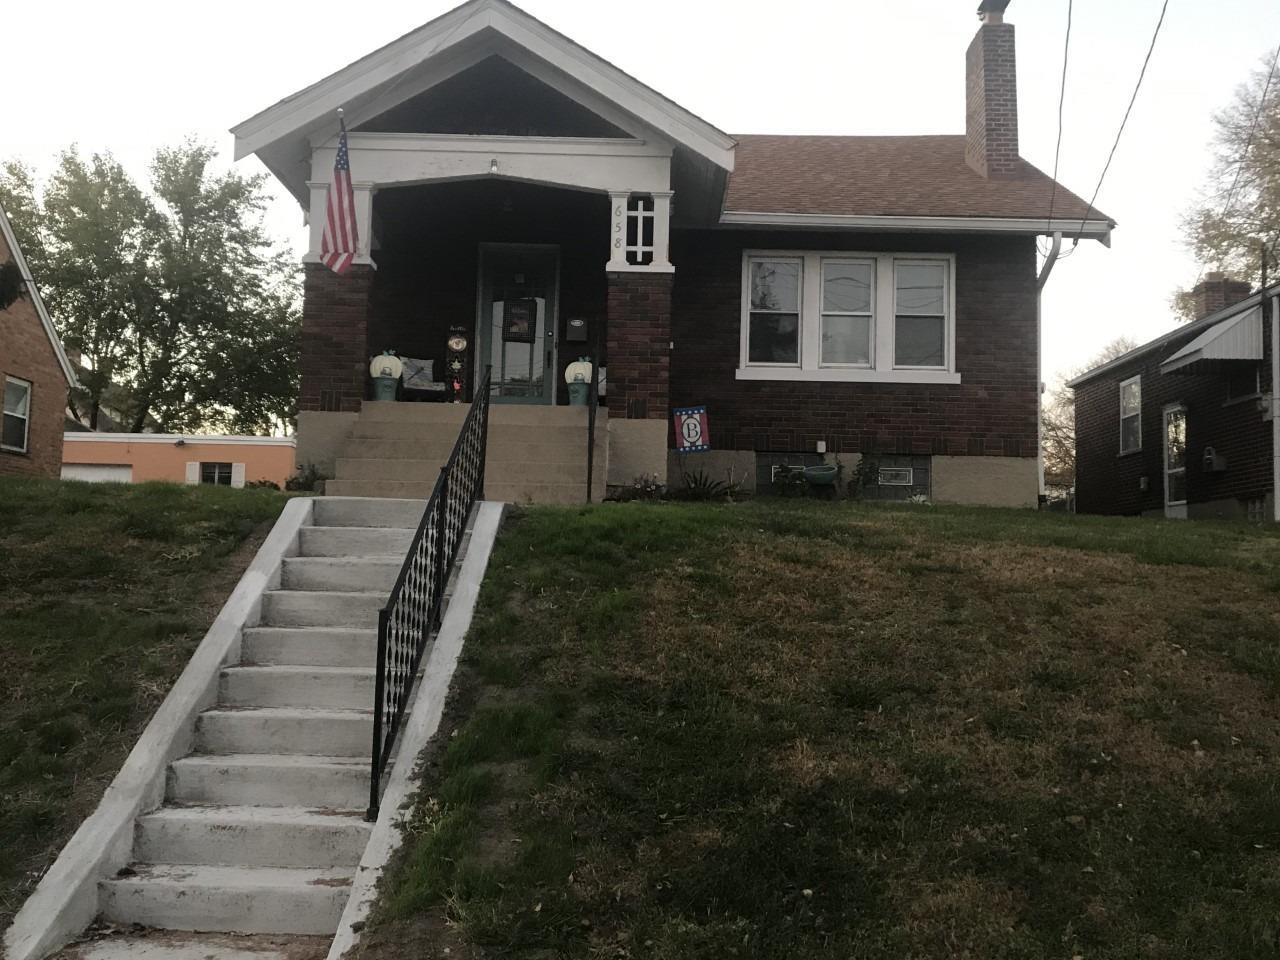 658 Elliott Ave Arlington Hts., OH